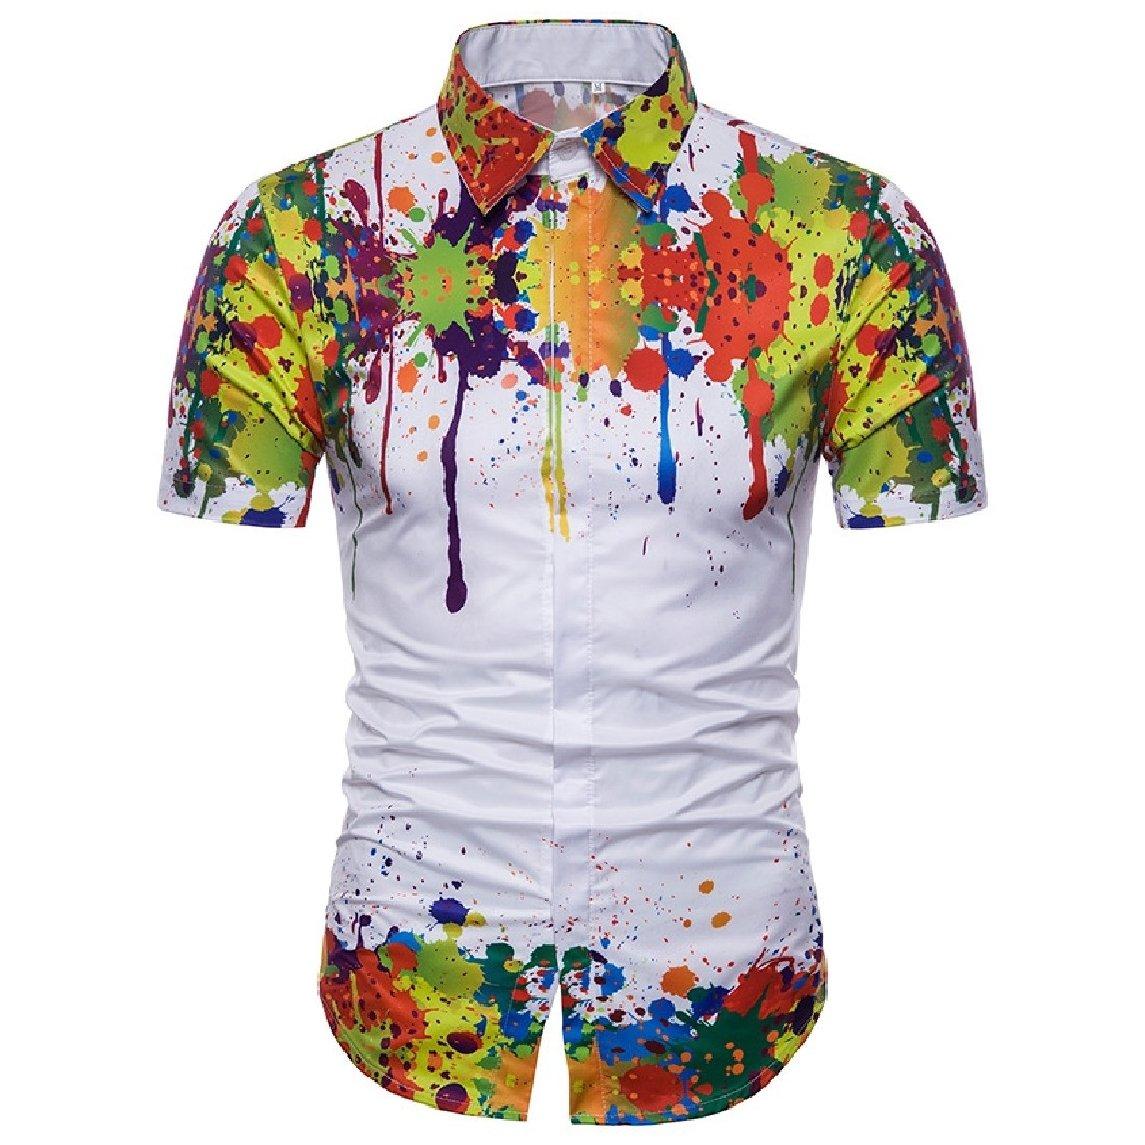 Nicelly Mens Summer Splash Ink Printed Graffiti Print Short Sleeve